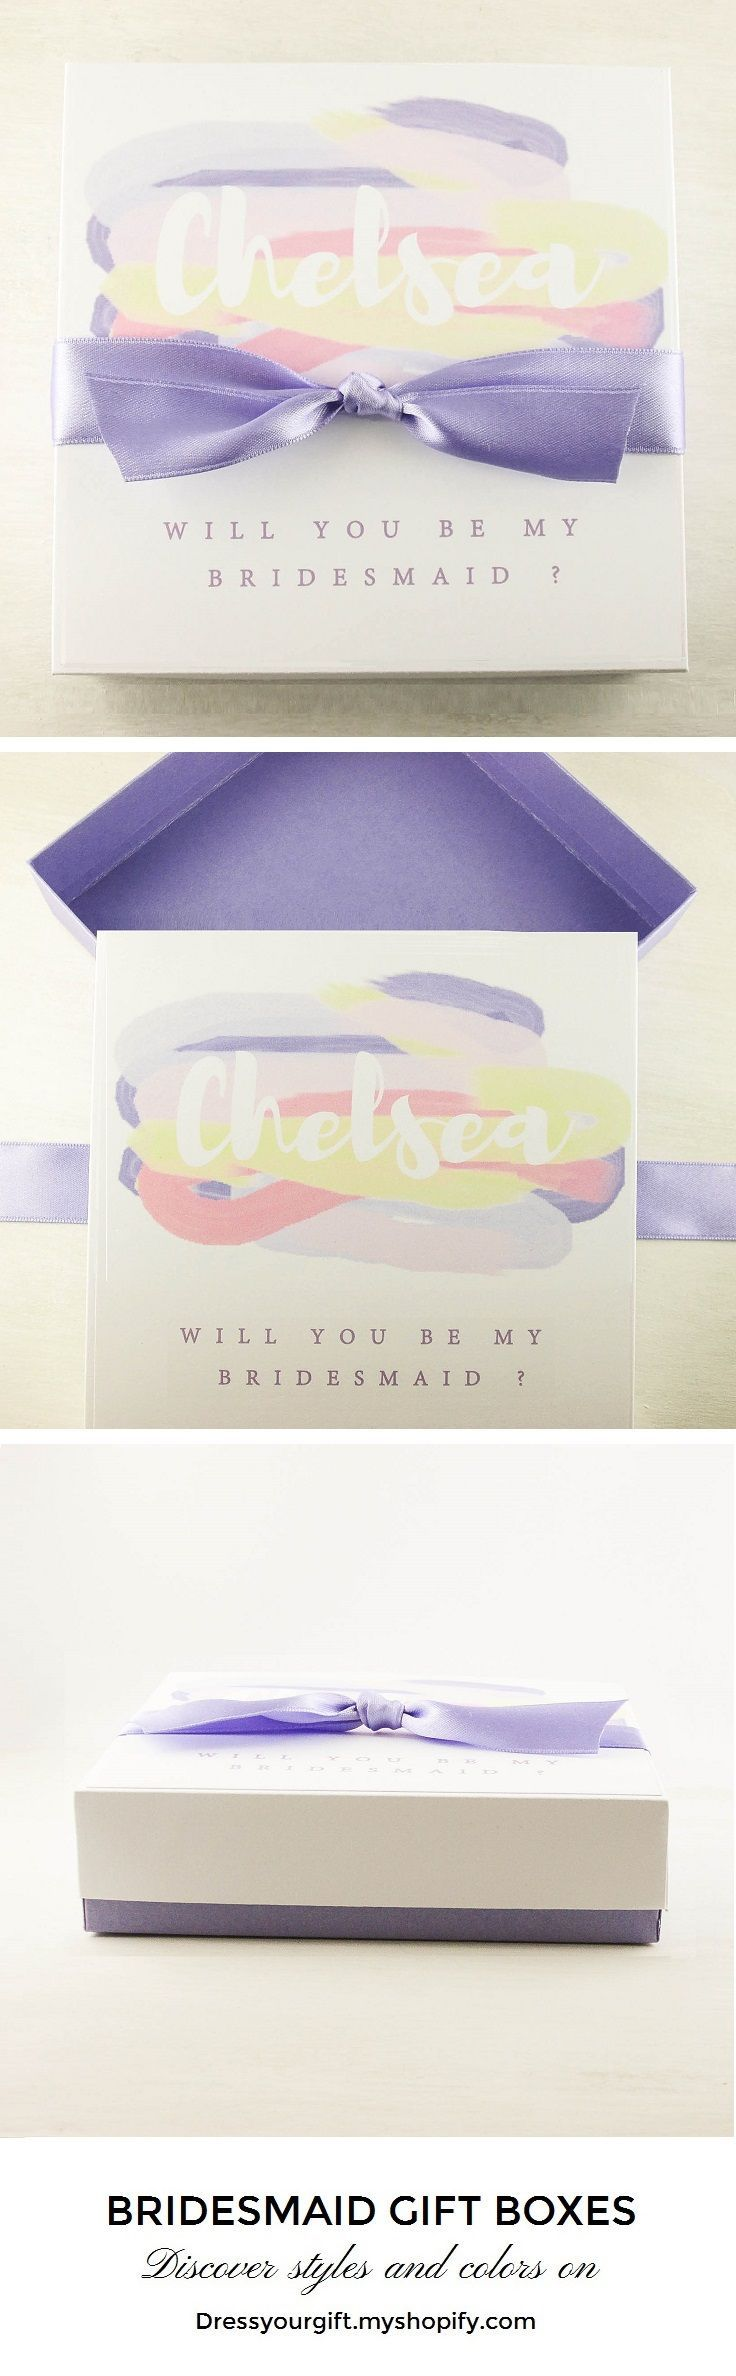 Personalized purple asking Bridesmaid box purple Bridesmaid gifts #bridalshowergift #bridalshowerpresent #maidofhonorproposal #demoiselledhonneur #damadehonor #trauzeugin #brautjungfern